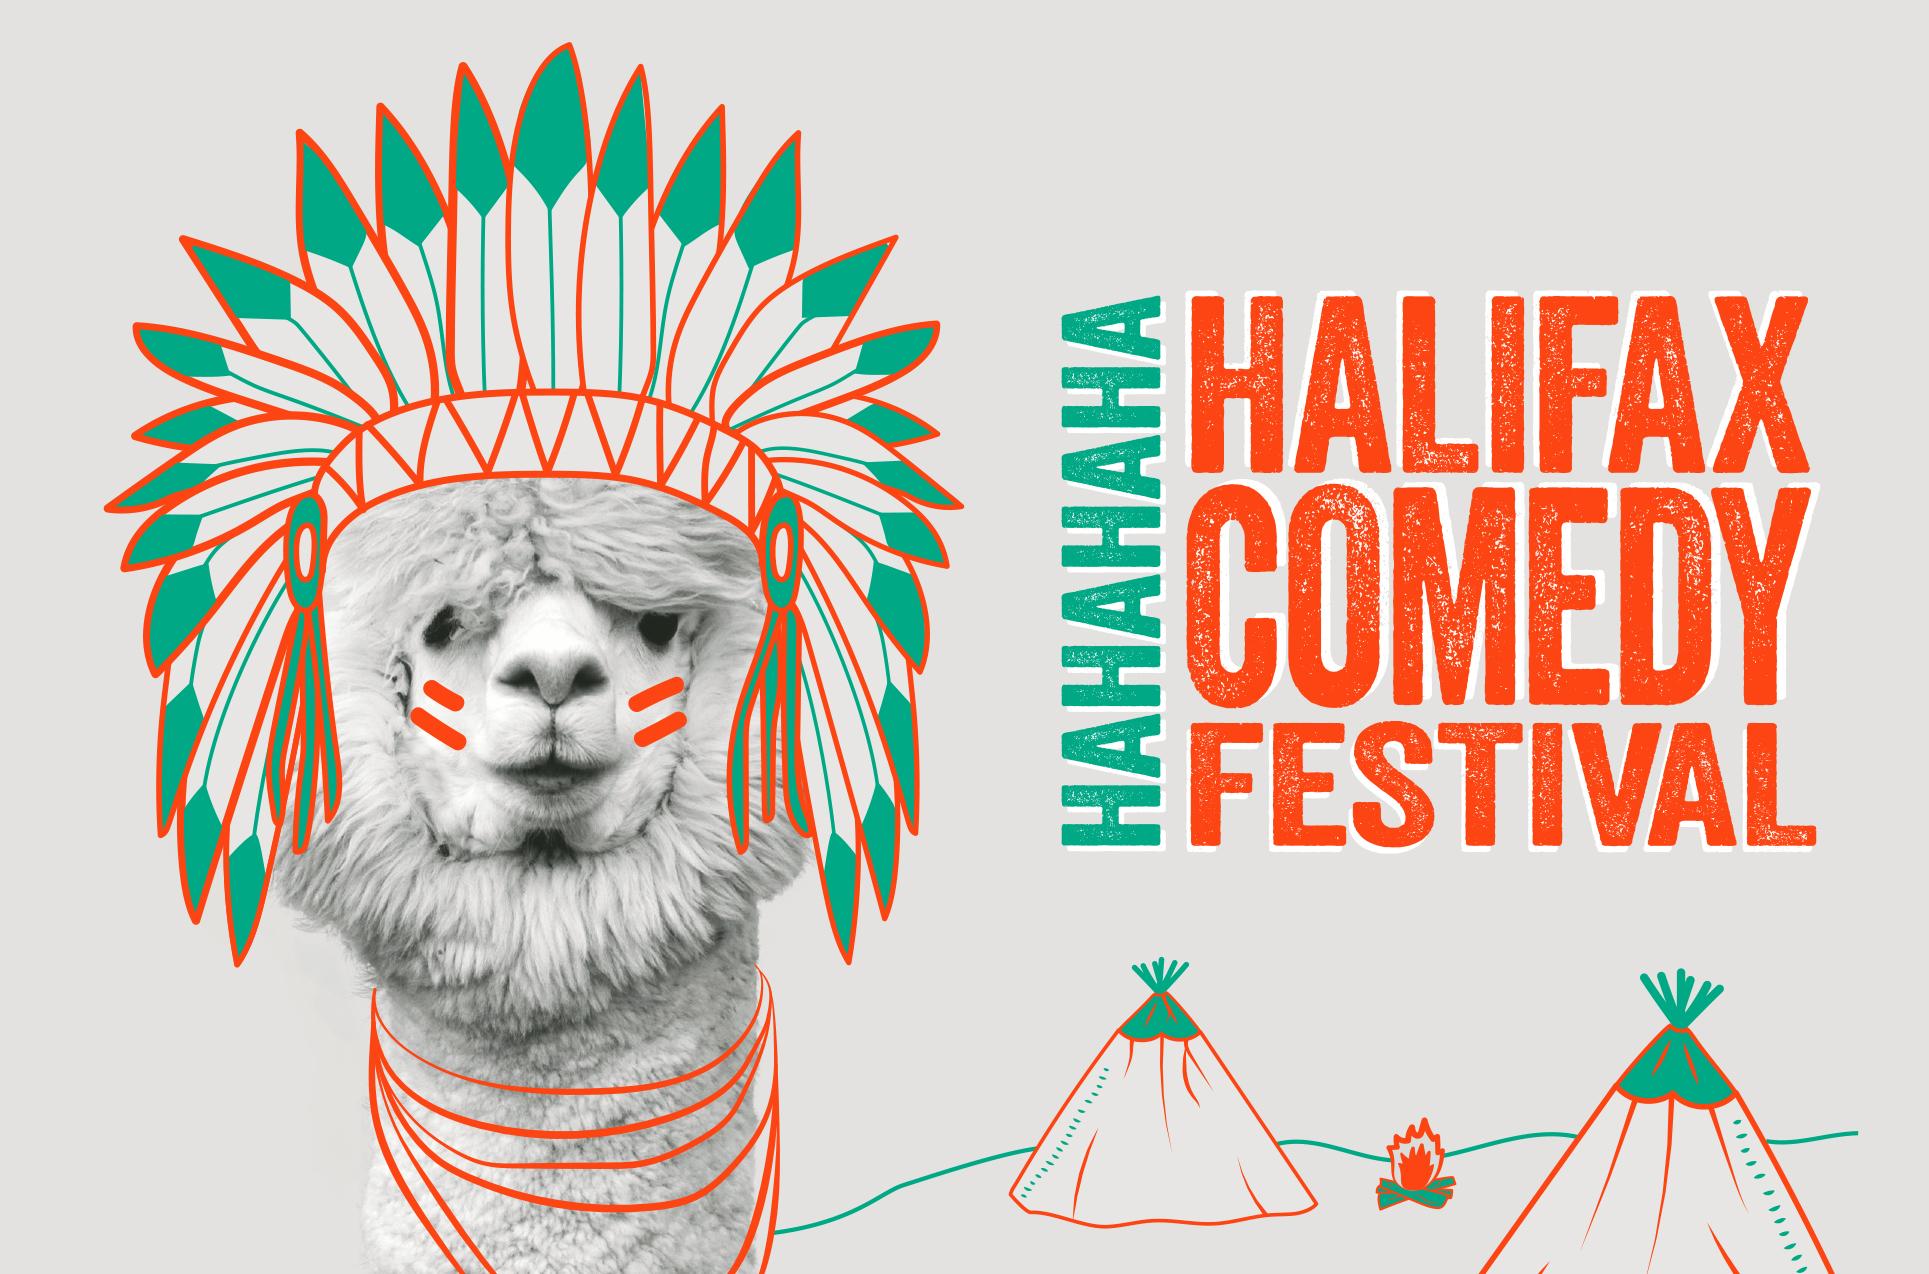 Halifax Comedy Festival